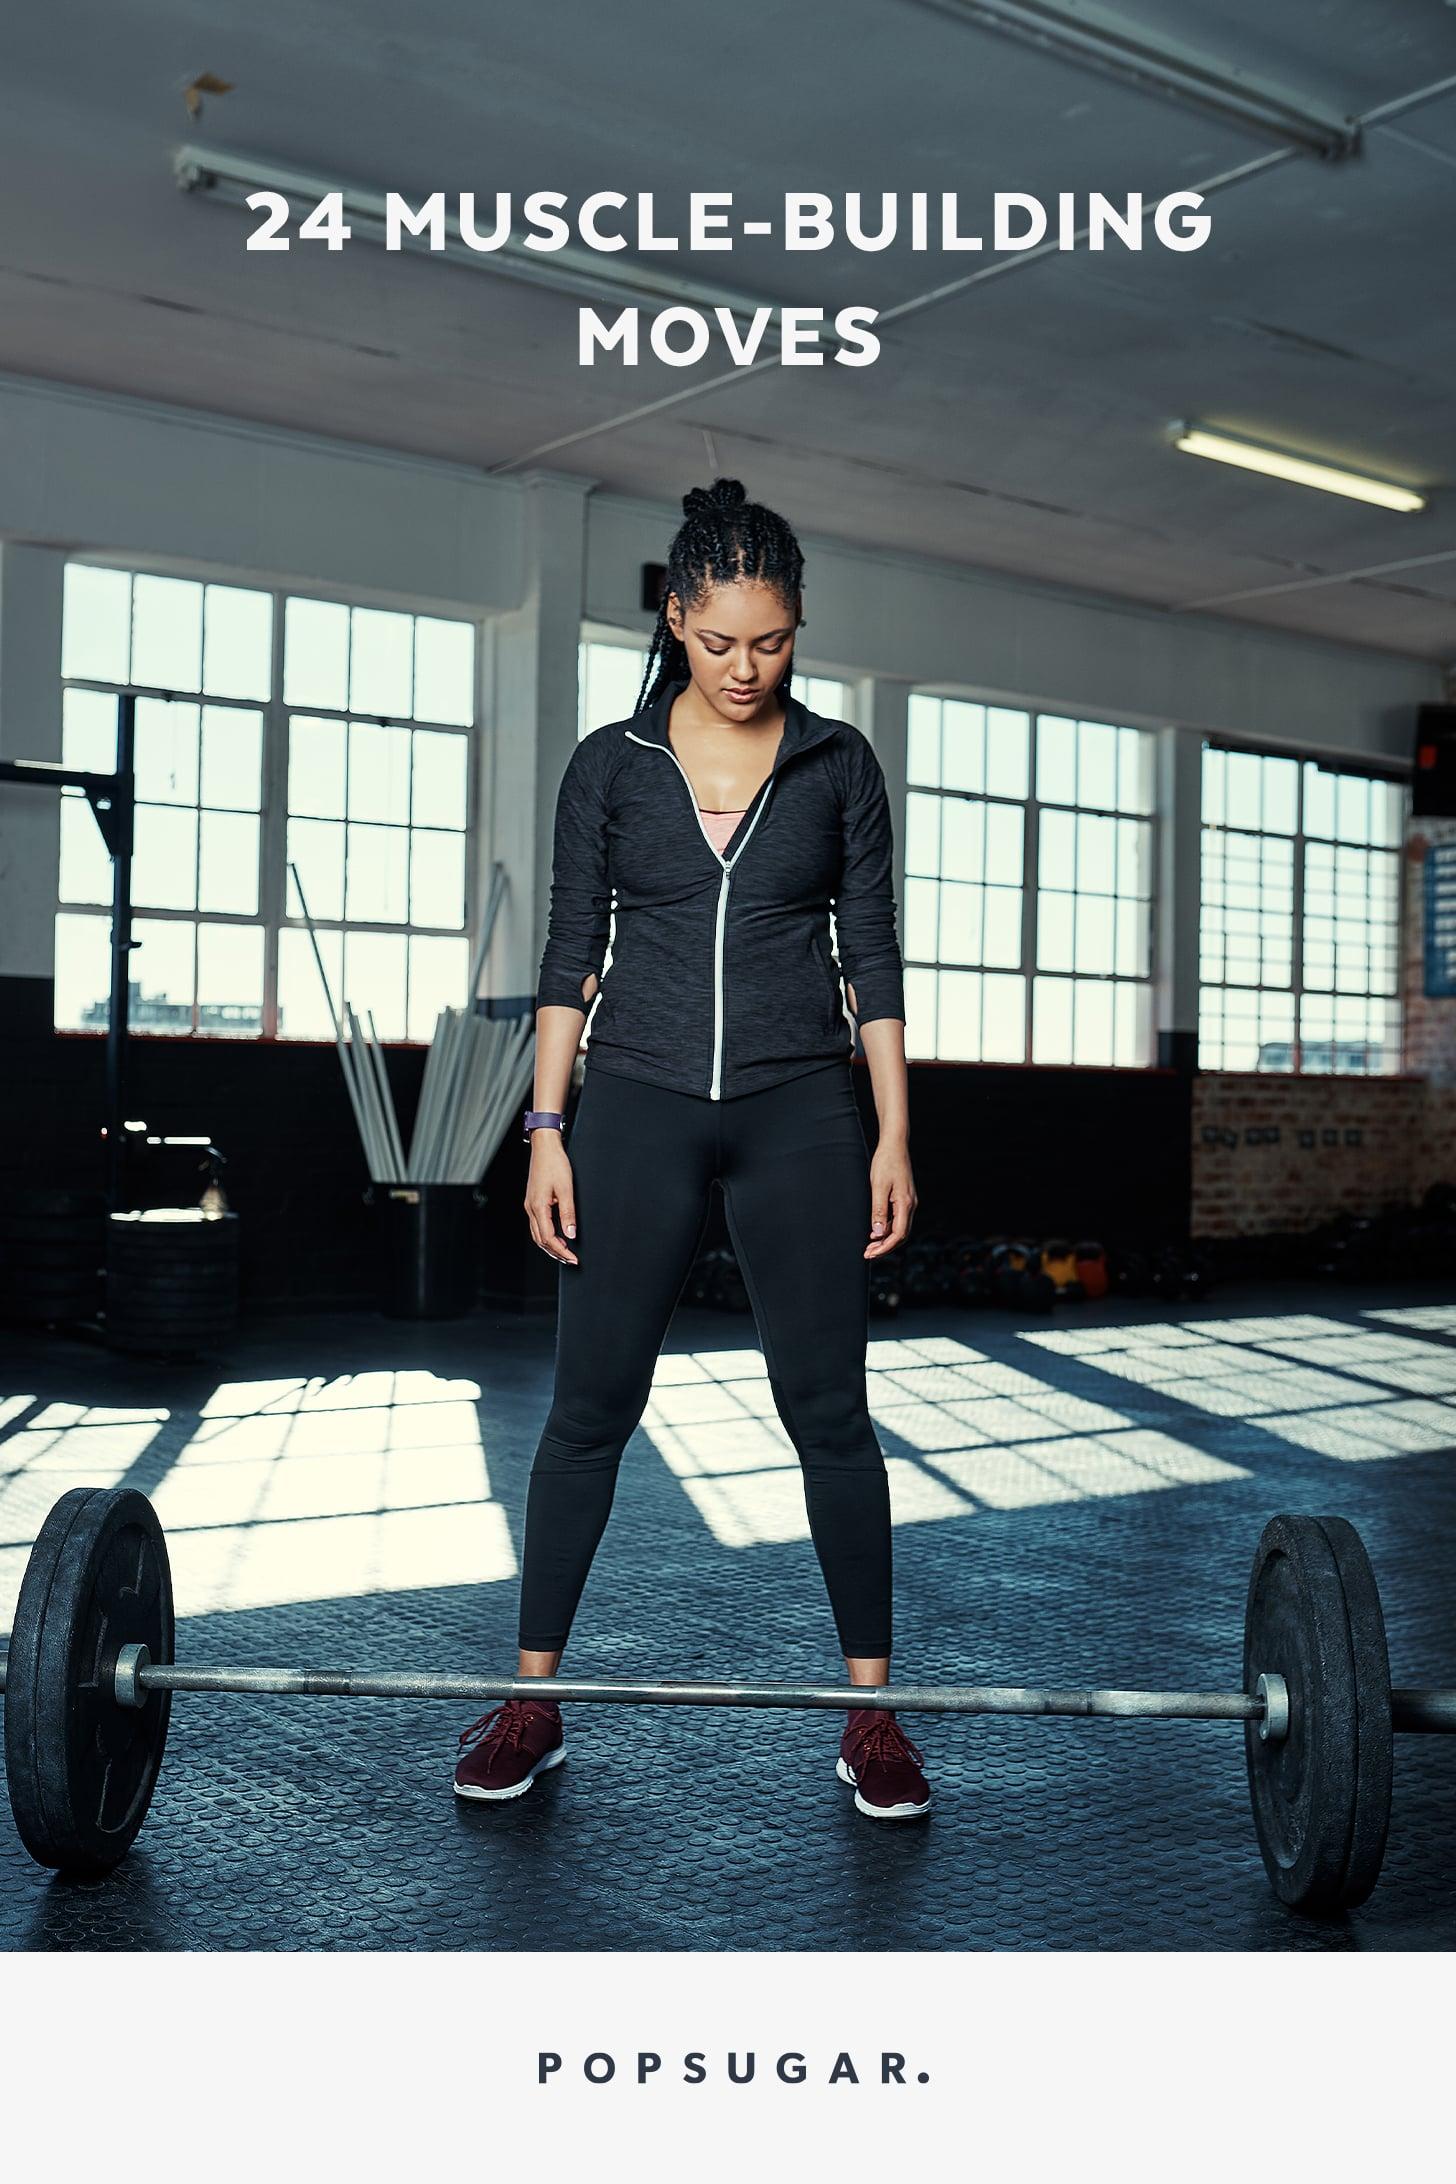 Best Muscle Building Exercises Popsugar Fitness